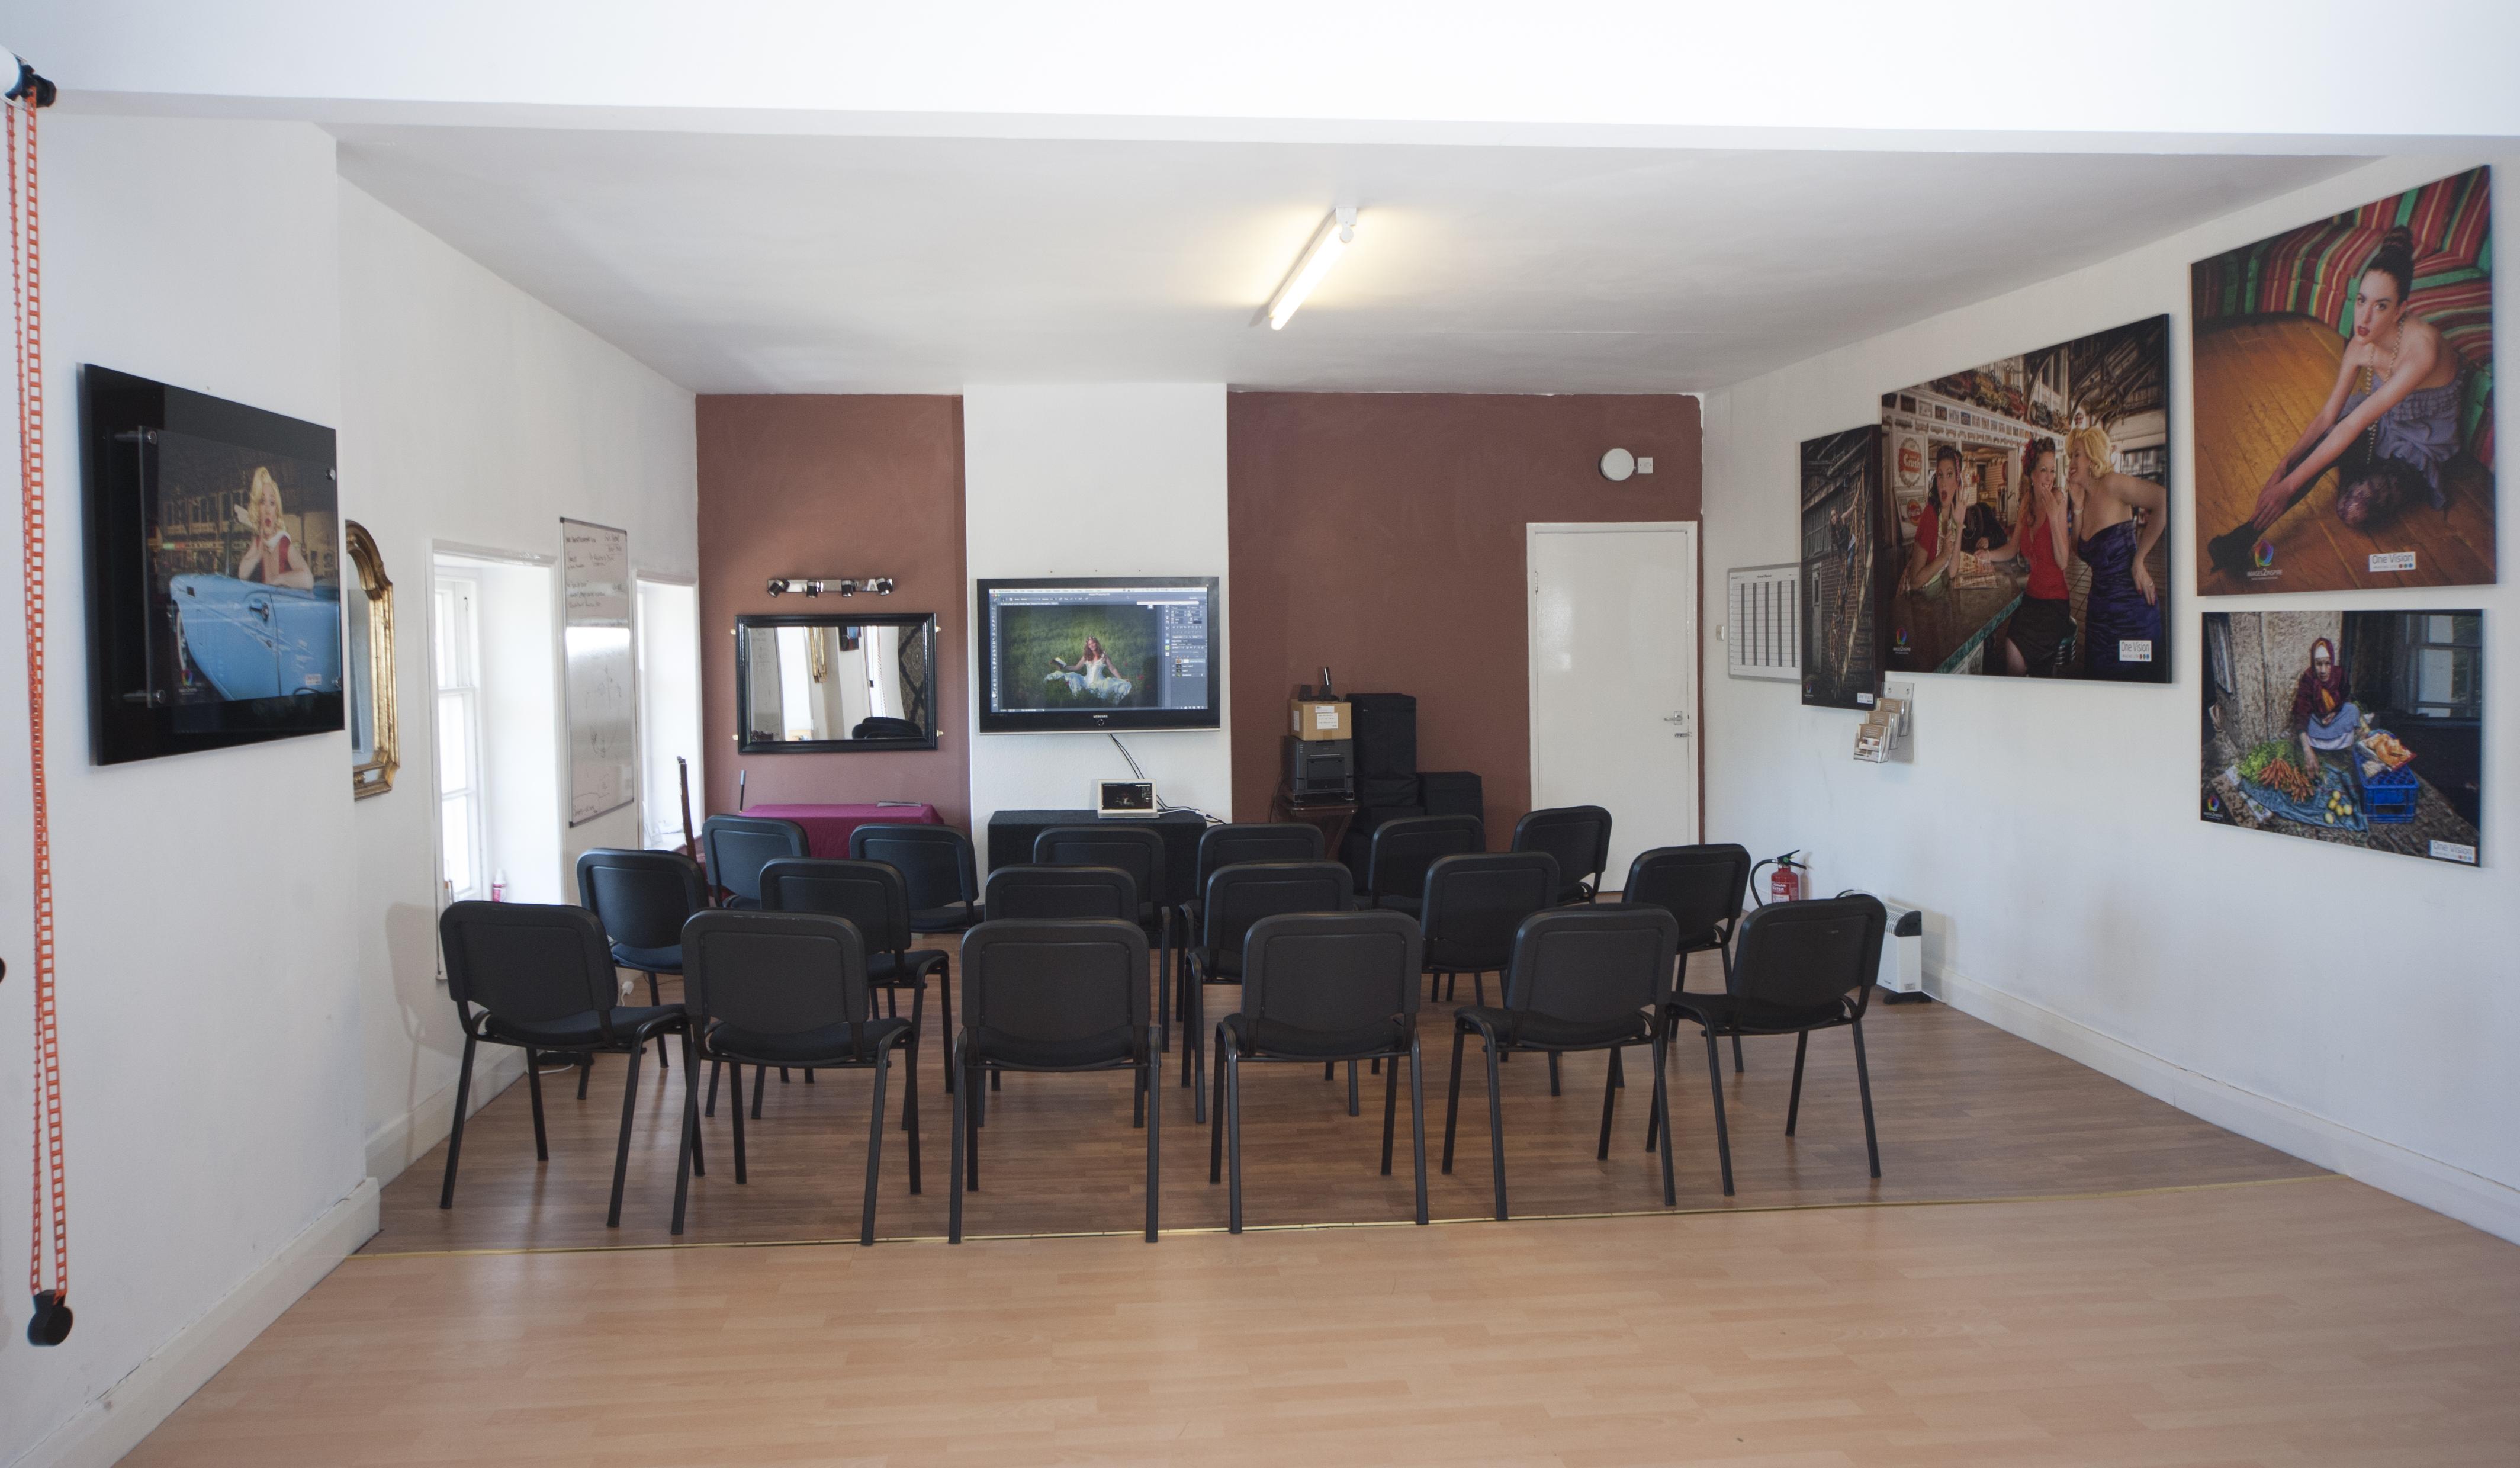 Meeting Room Hire Leamington Spa